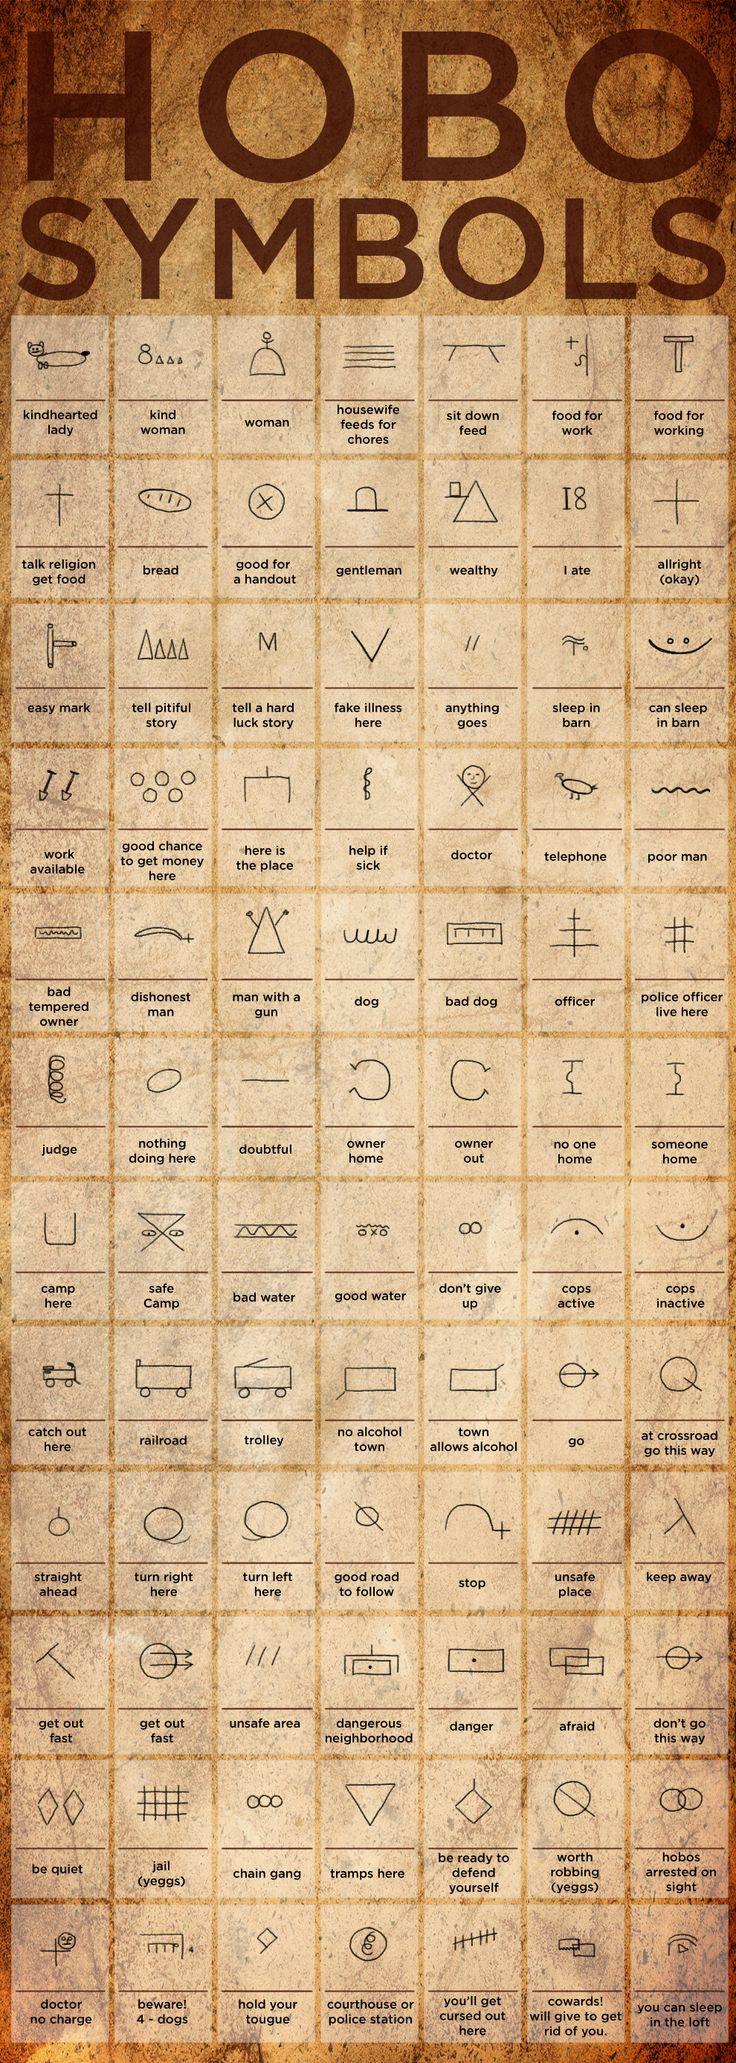 Hobo-Symbols